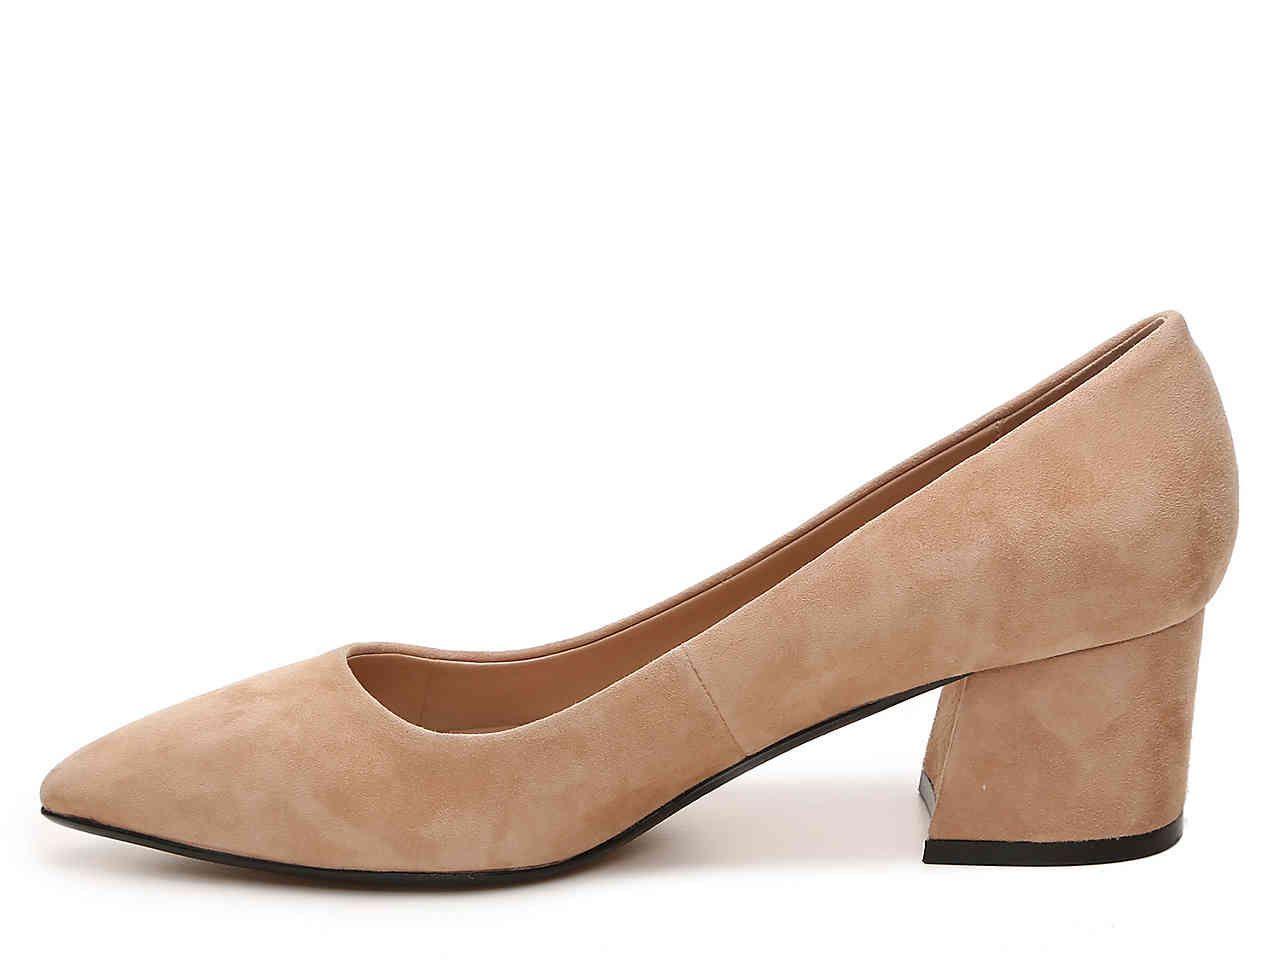 625e1ec83de7 Aldo Hillers Pump Women s Shoes